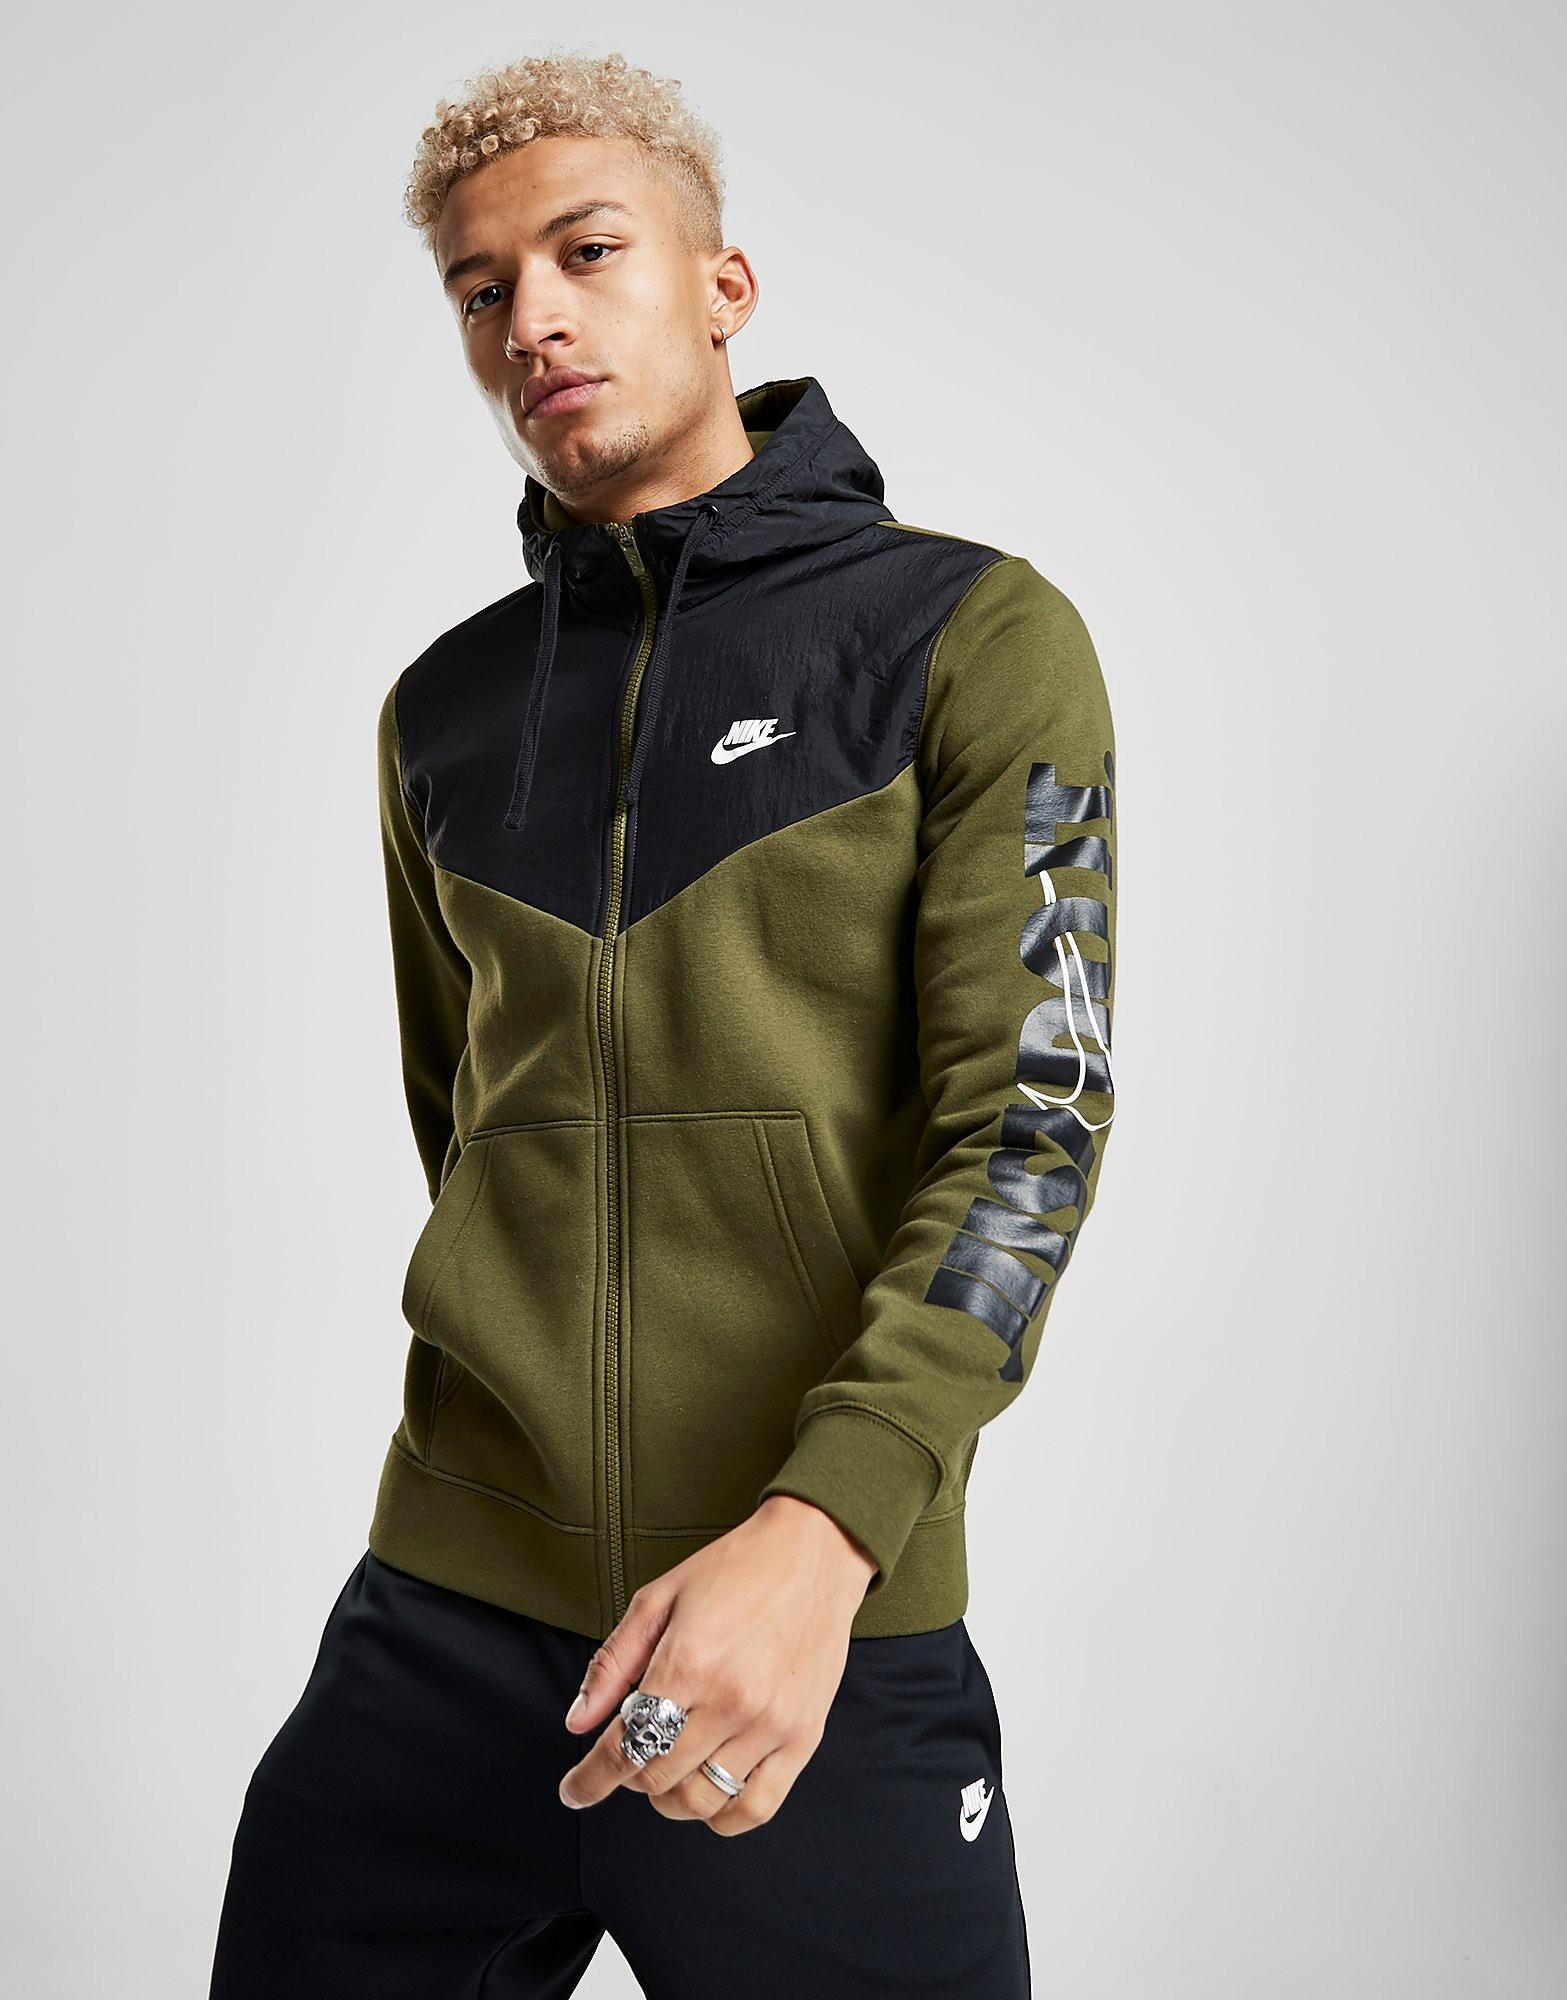 Nike Just Do It Sleeve Logo Hoodie Heren - Groen - Heren